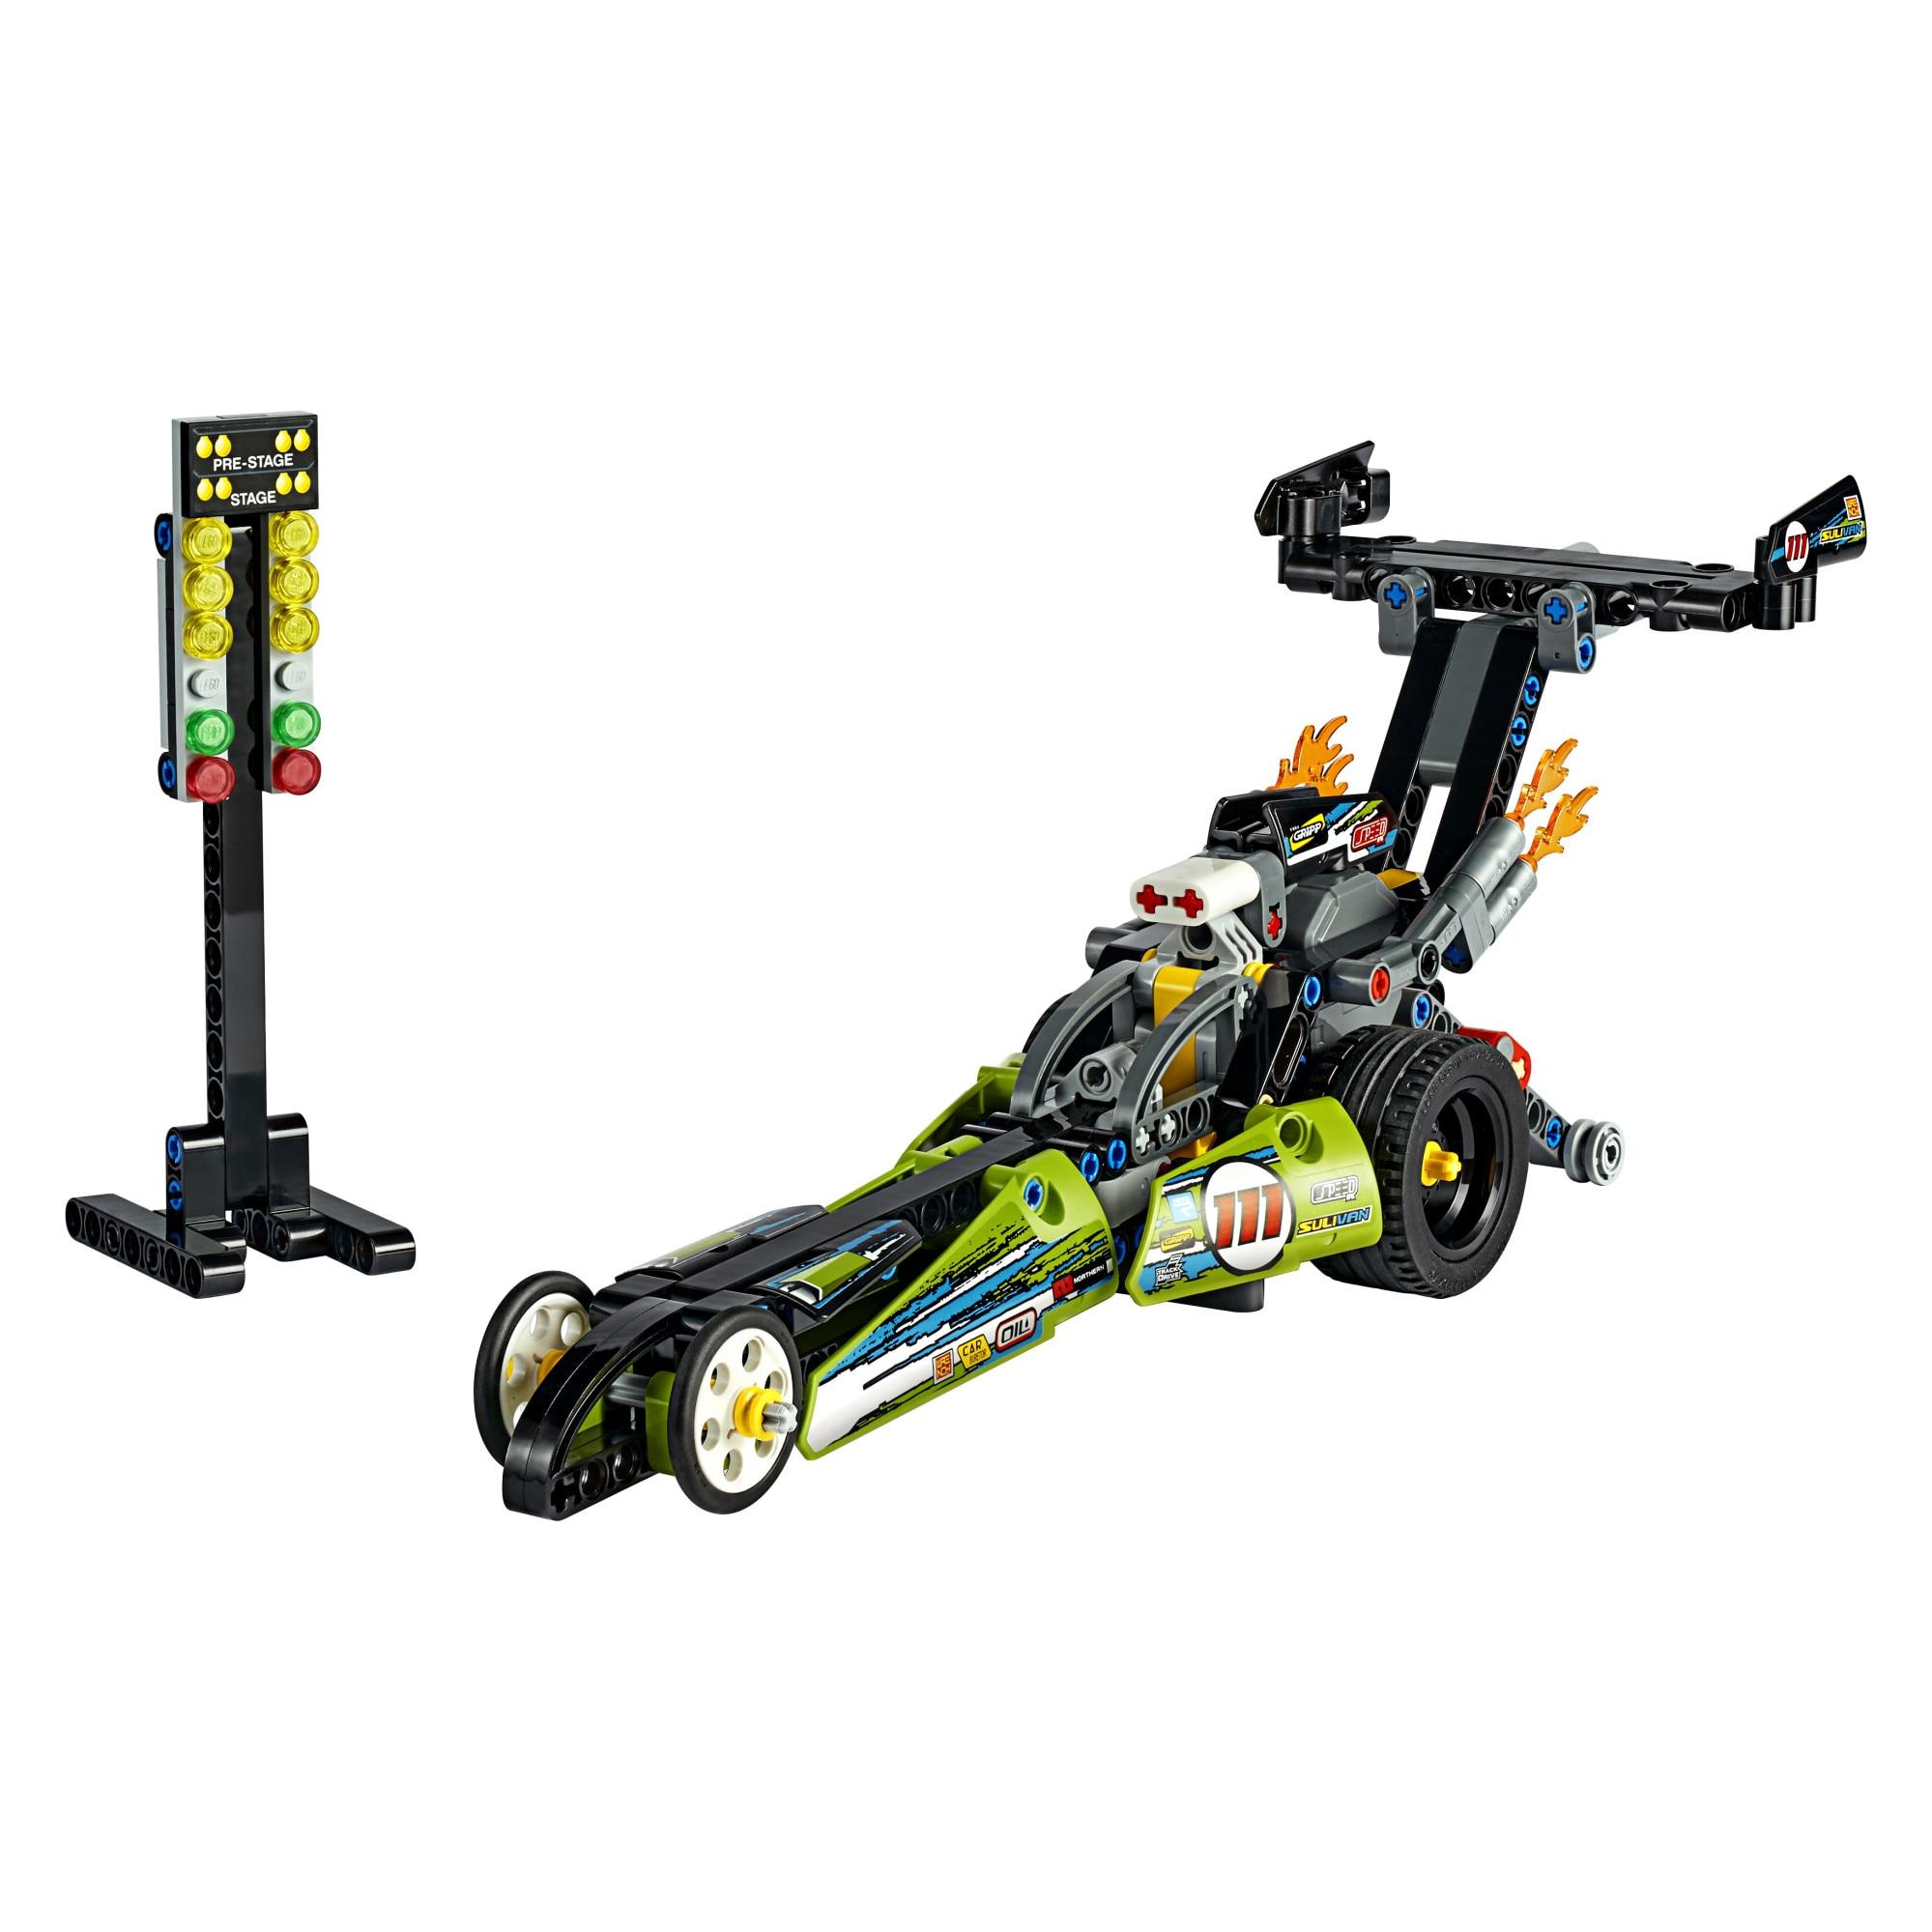 LEGO Technic 42103 Dragster sUOfVn